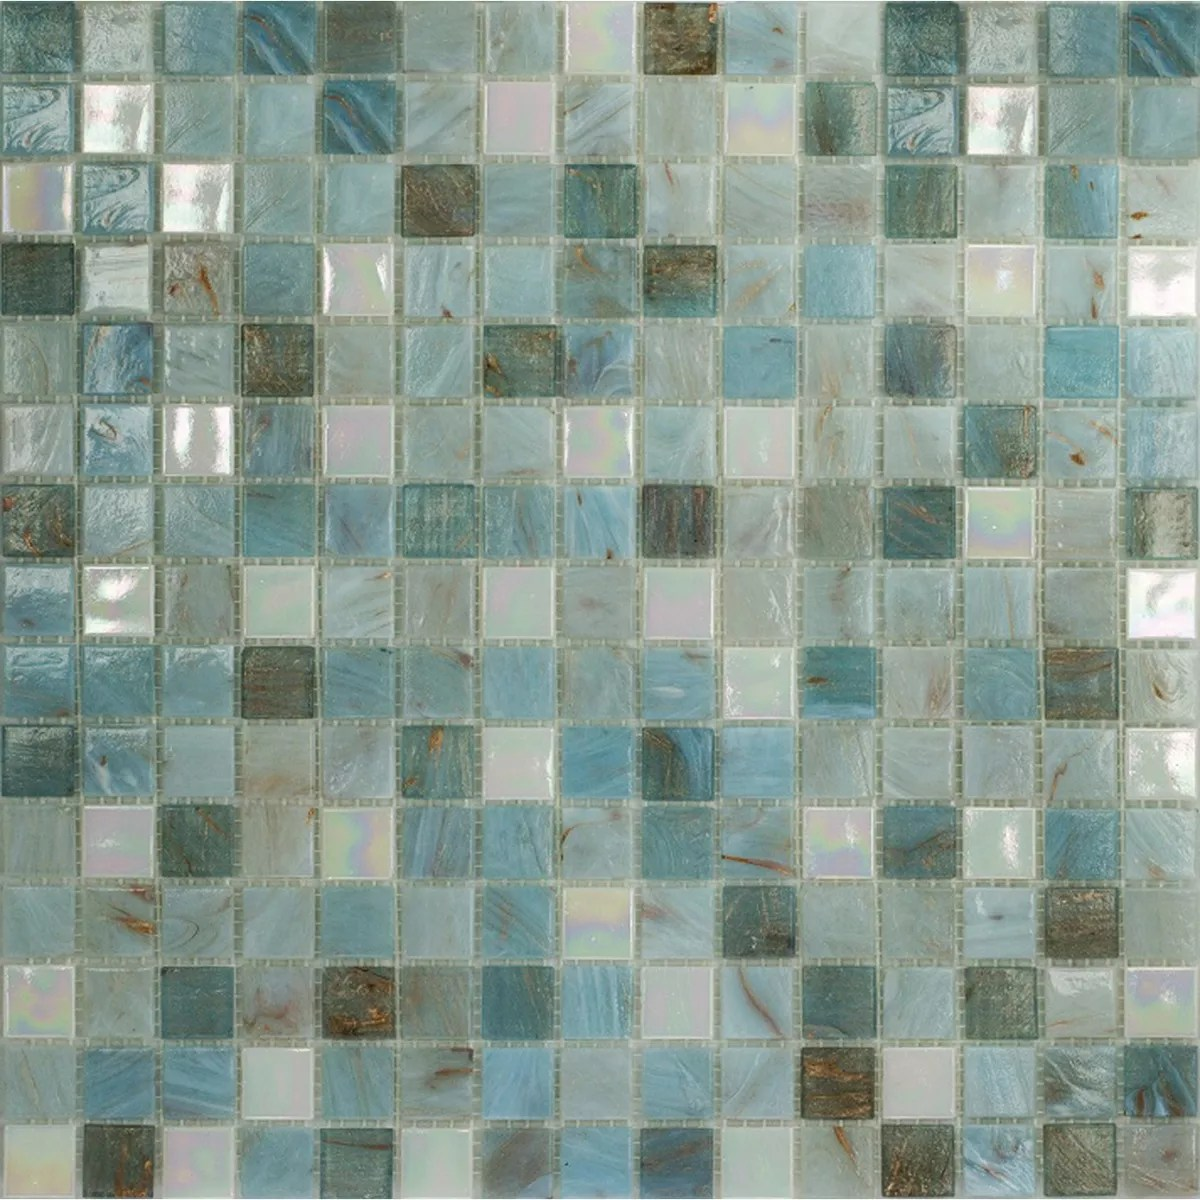 Piastrelle Bagno Mosaico Prezzi Mosaico With Piastrelle Bagno Mosaico Prezzi Fabulous Cheap